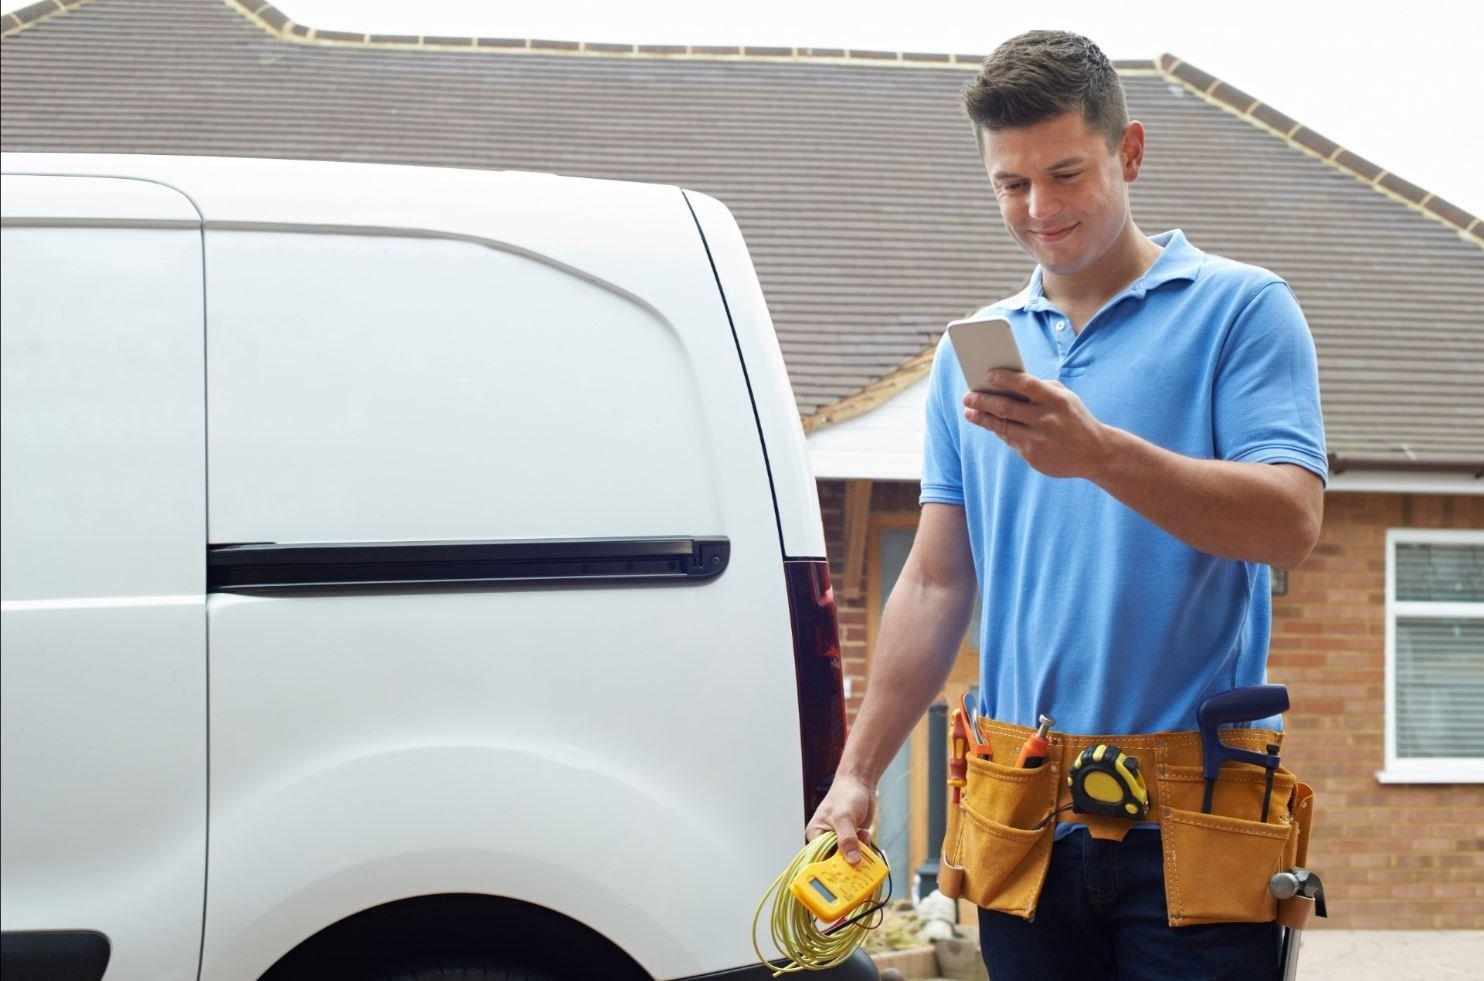 Tradesman looking at his mobile phone, smiling.